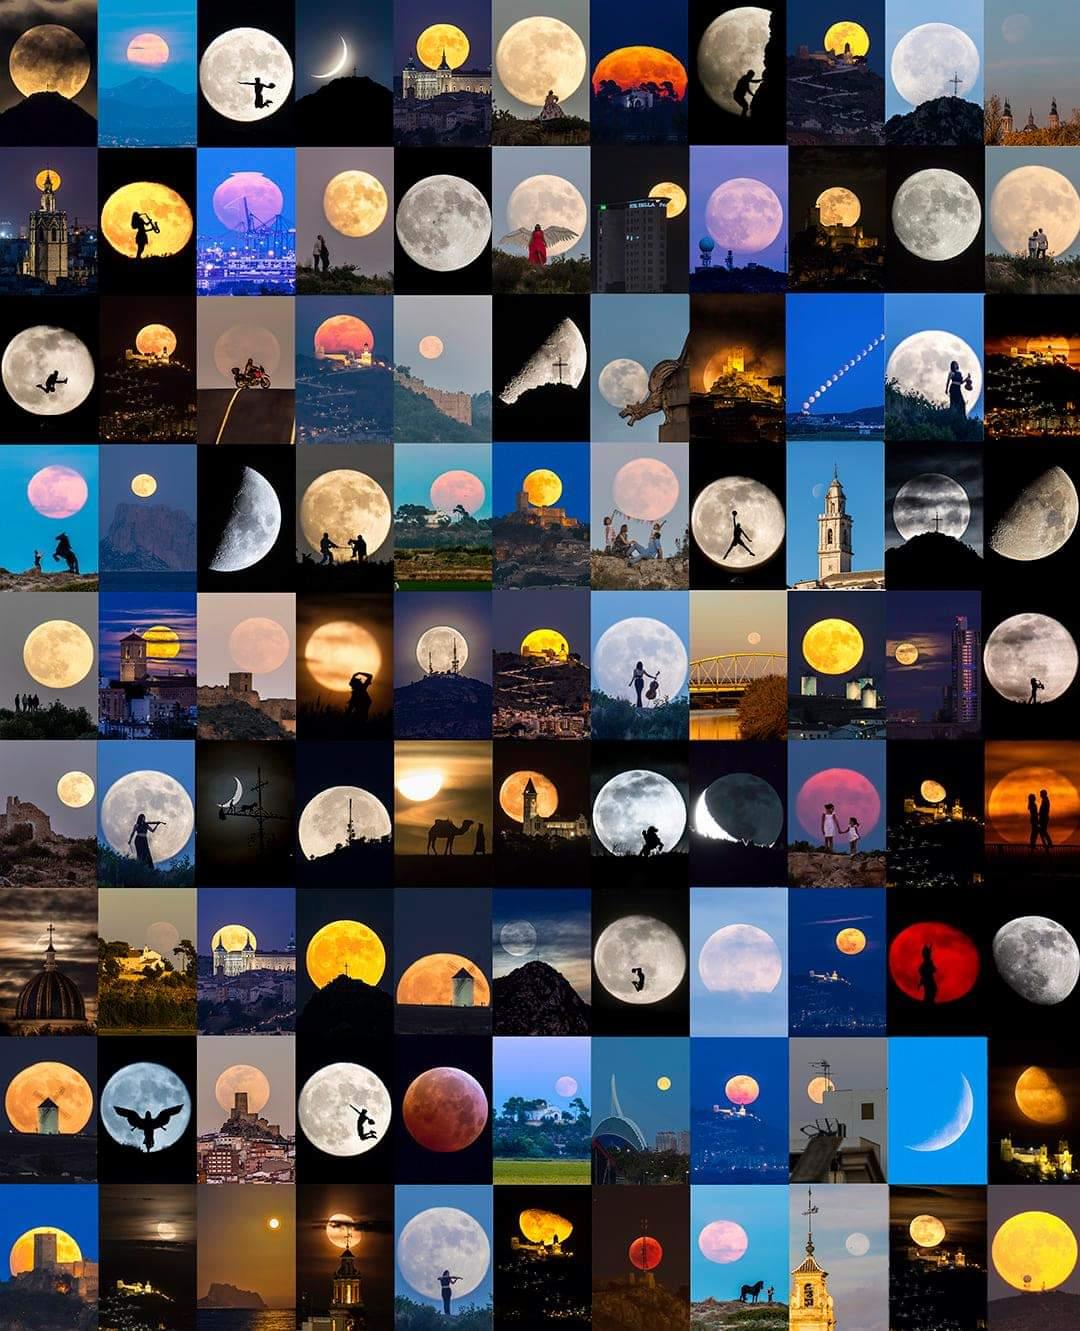 1Pic 1000 Words : Juan Antonio Sendra Captured 99 moons in 4years